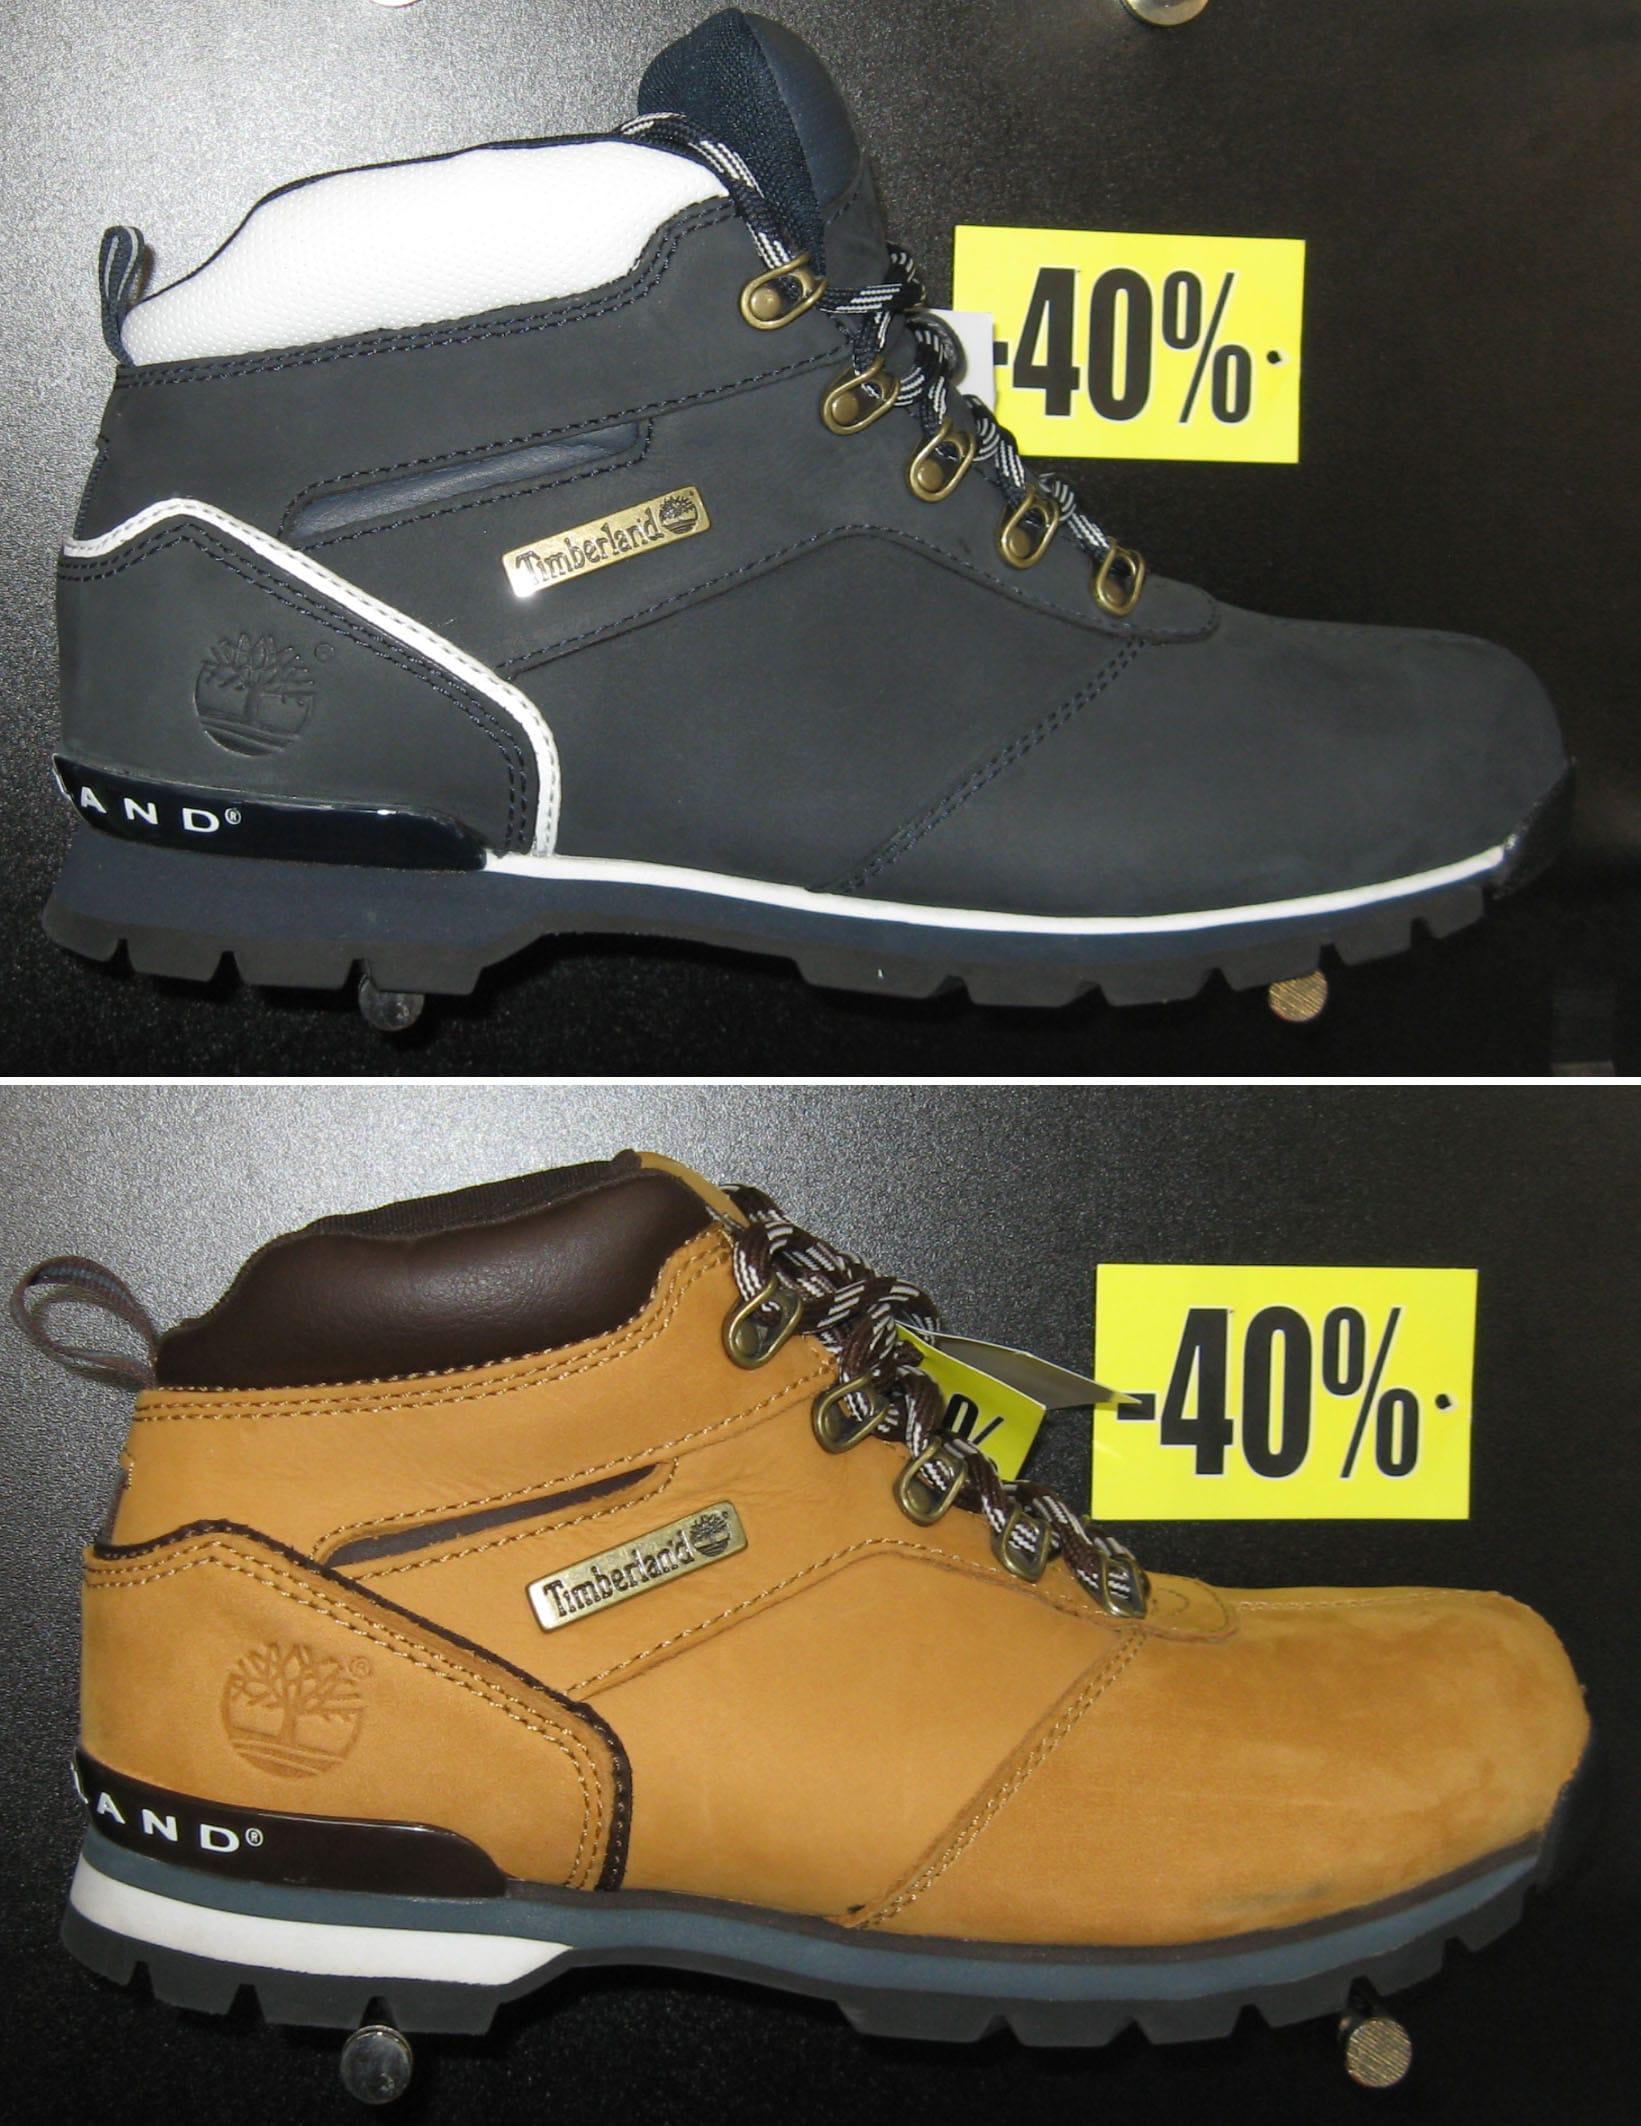 timberland-obuca-patike-cipele-00010